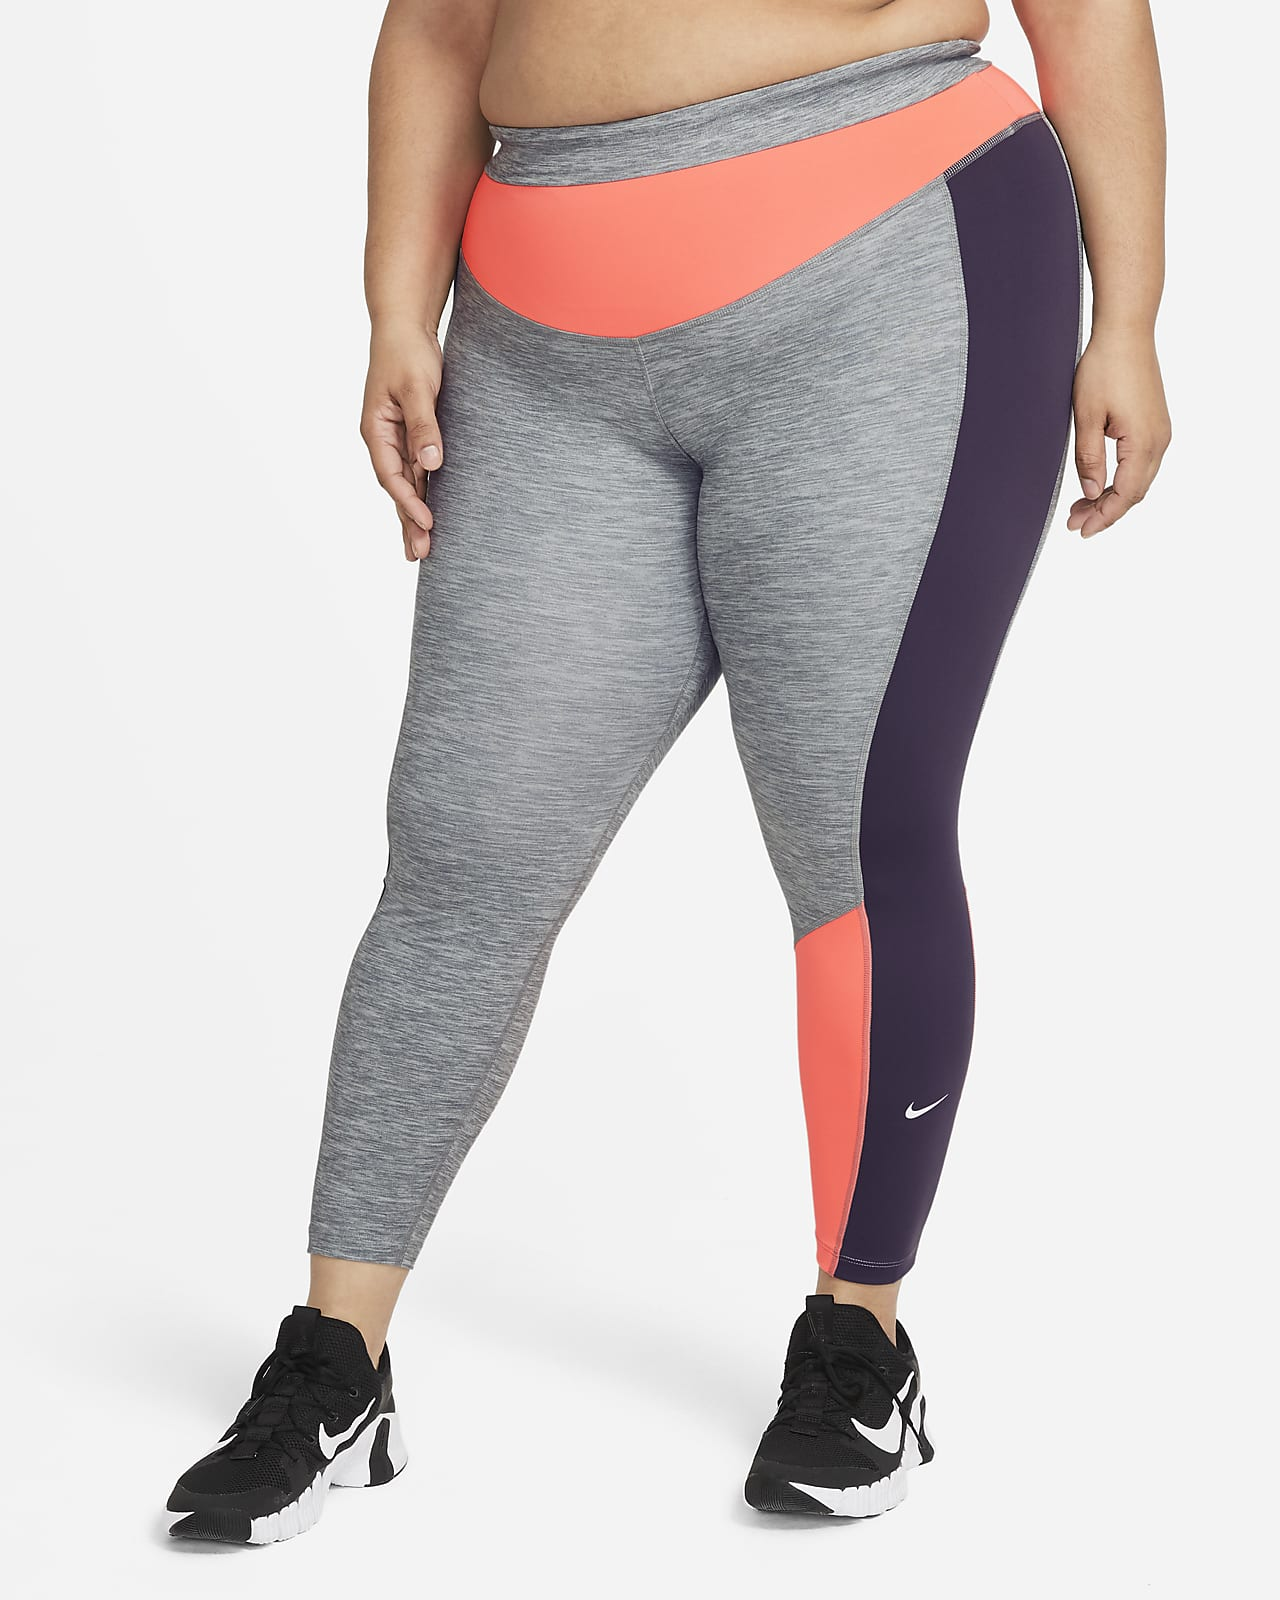 Nike One Women's 7/8 Heathered Color-Block Leggings (Plus Size)